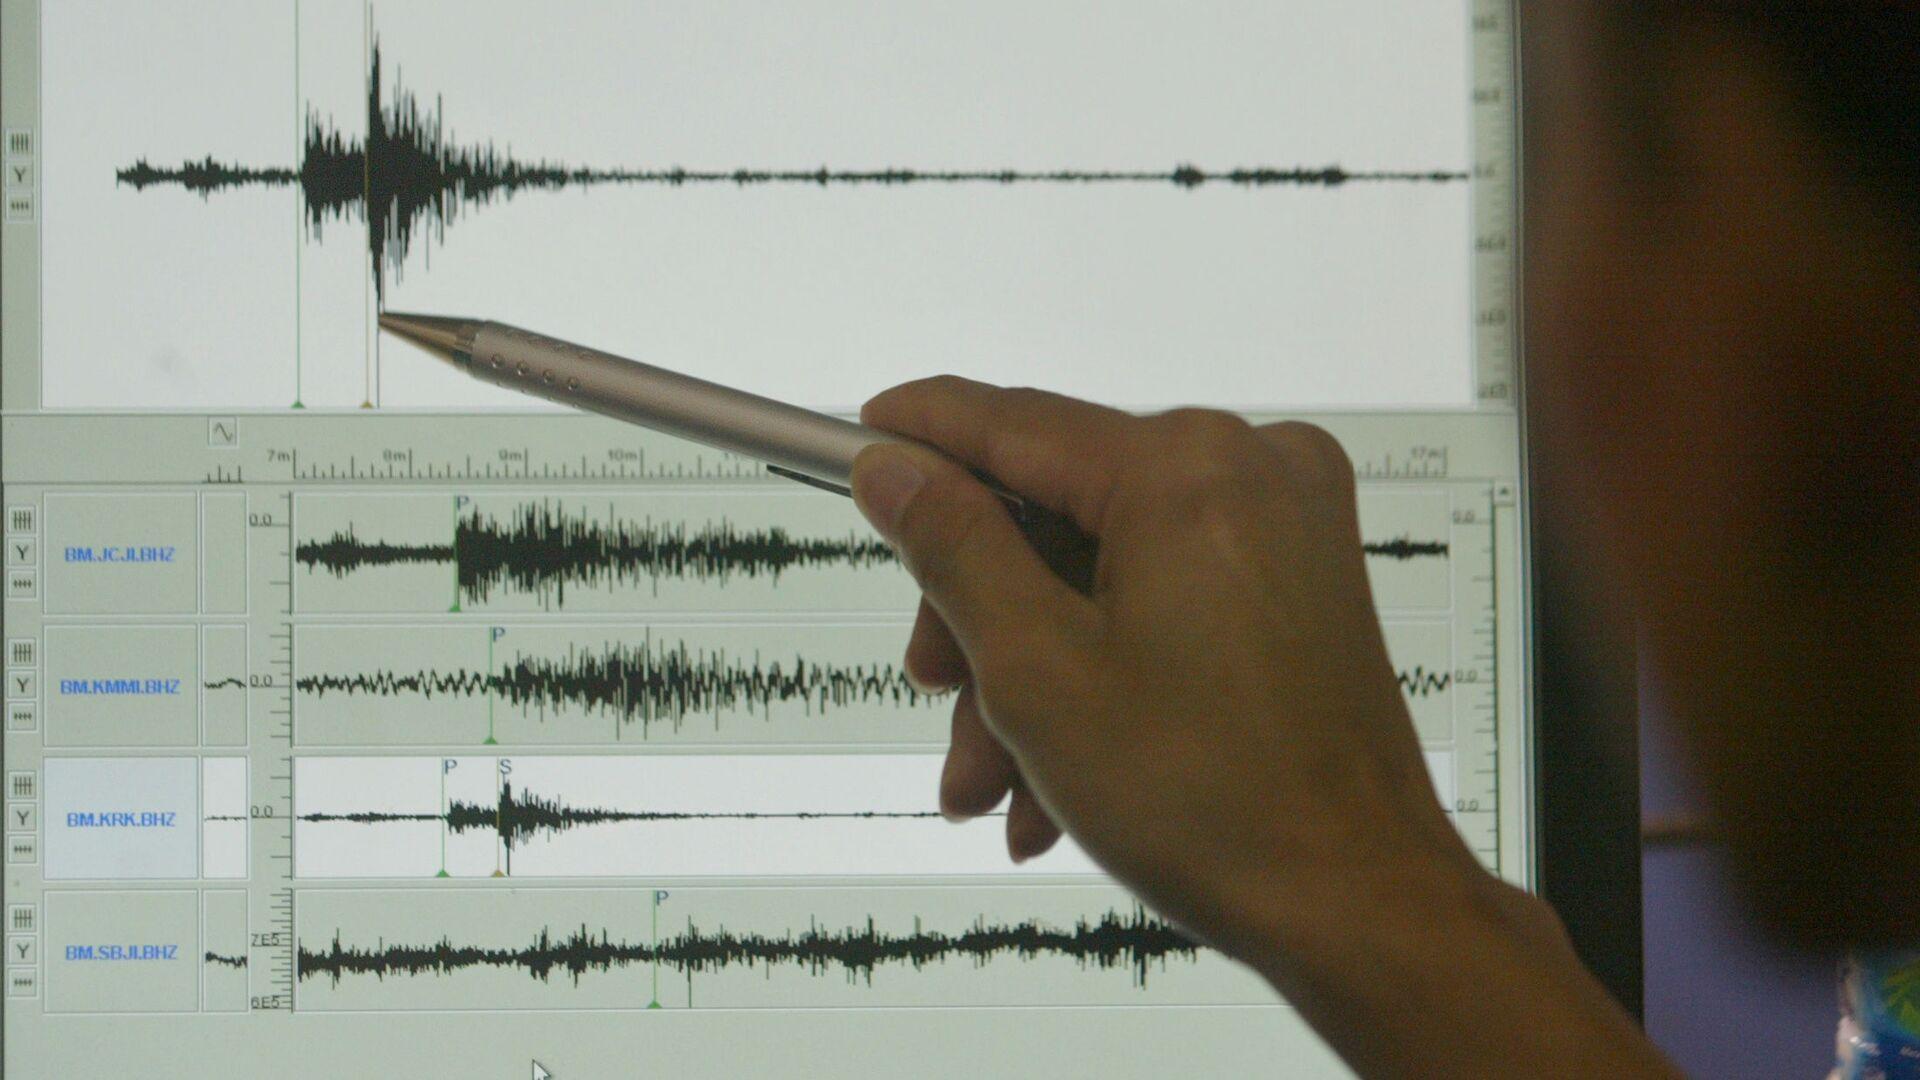 Sismografo di terremoto - Sputnik Italia, 1920, 01.07.2021